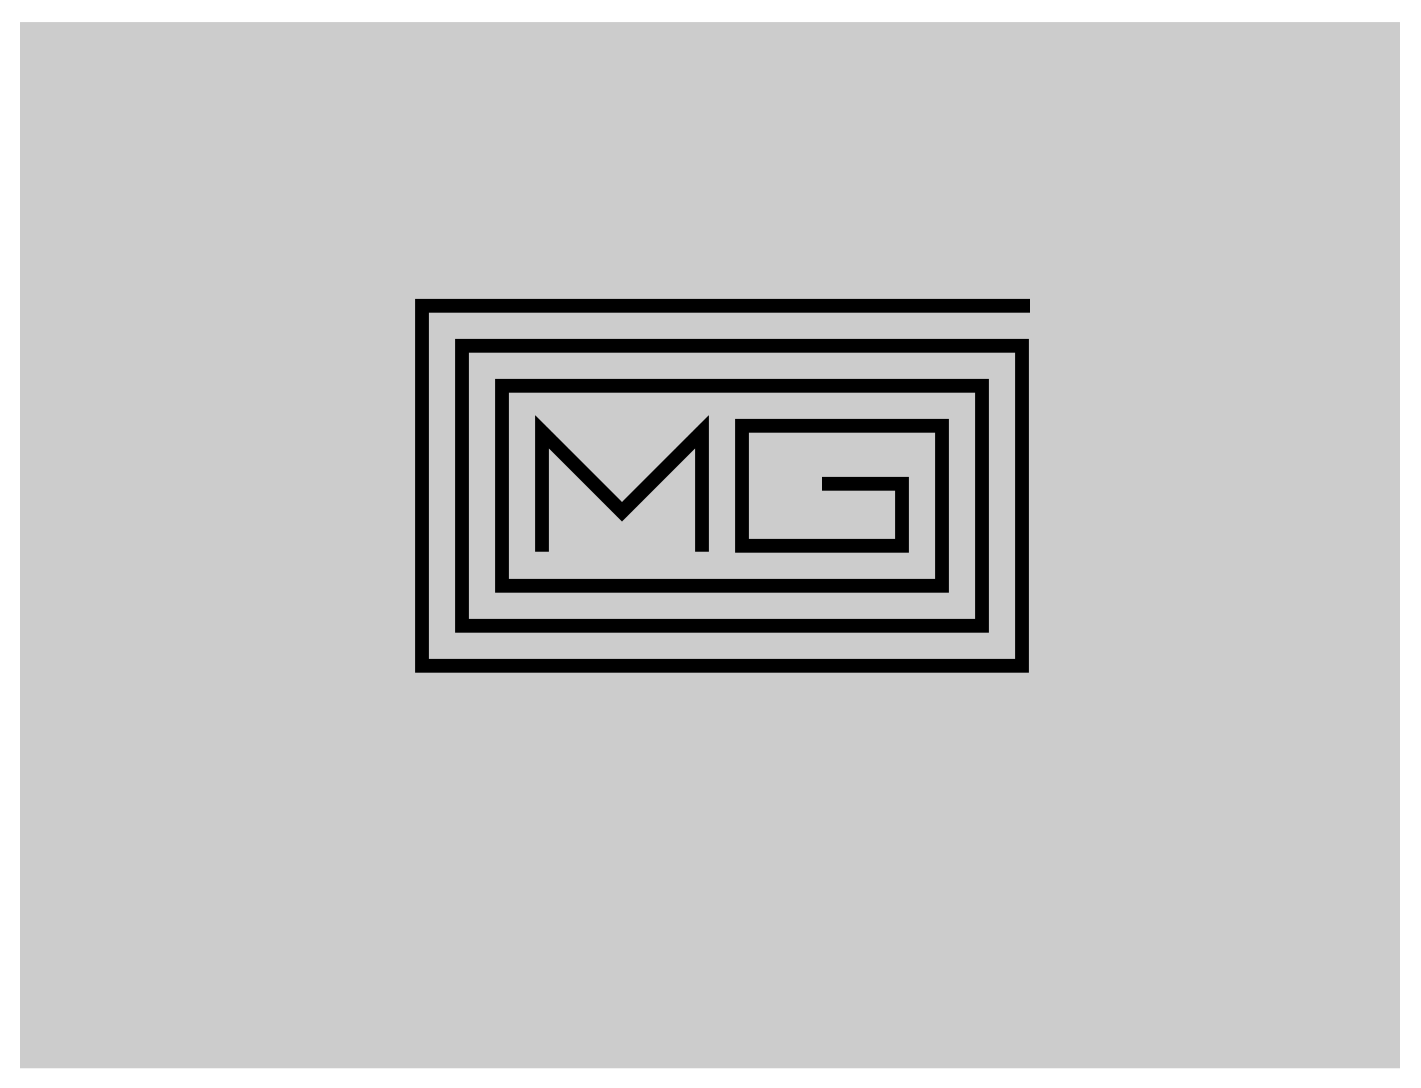 Custom Design by JaroslavProcka - Entry No. 178 in the Custom Design Contest Imaginative Custom Design for MG.